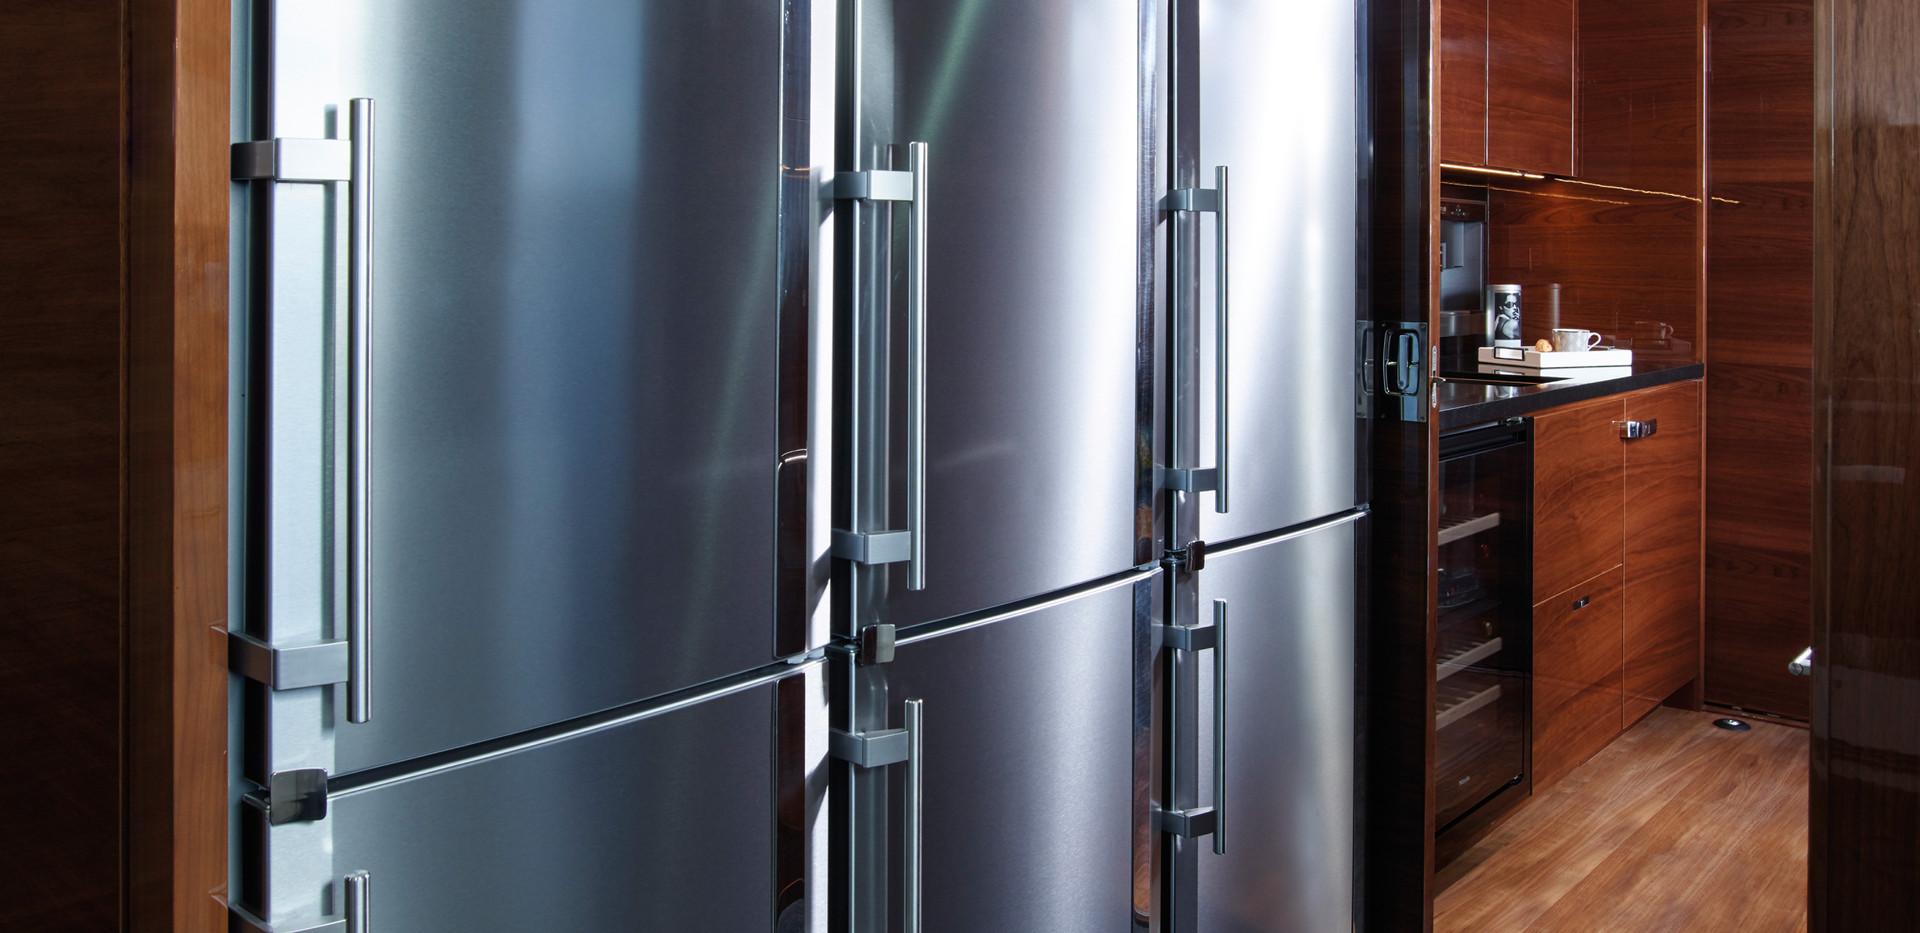 35m-interior-galley-fridge-detail-americ